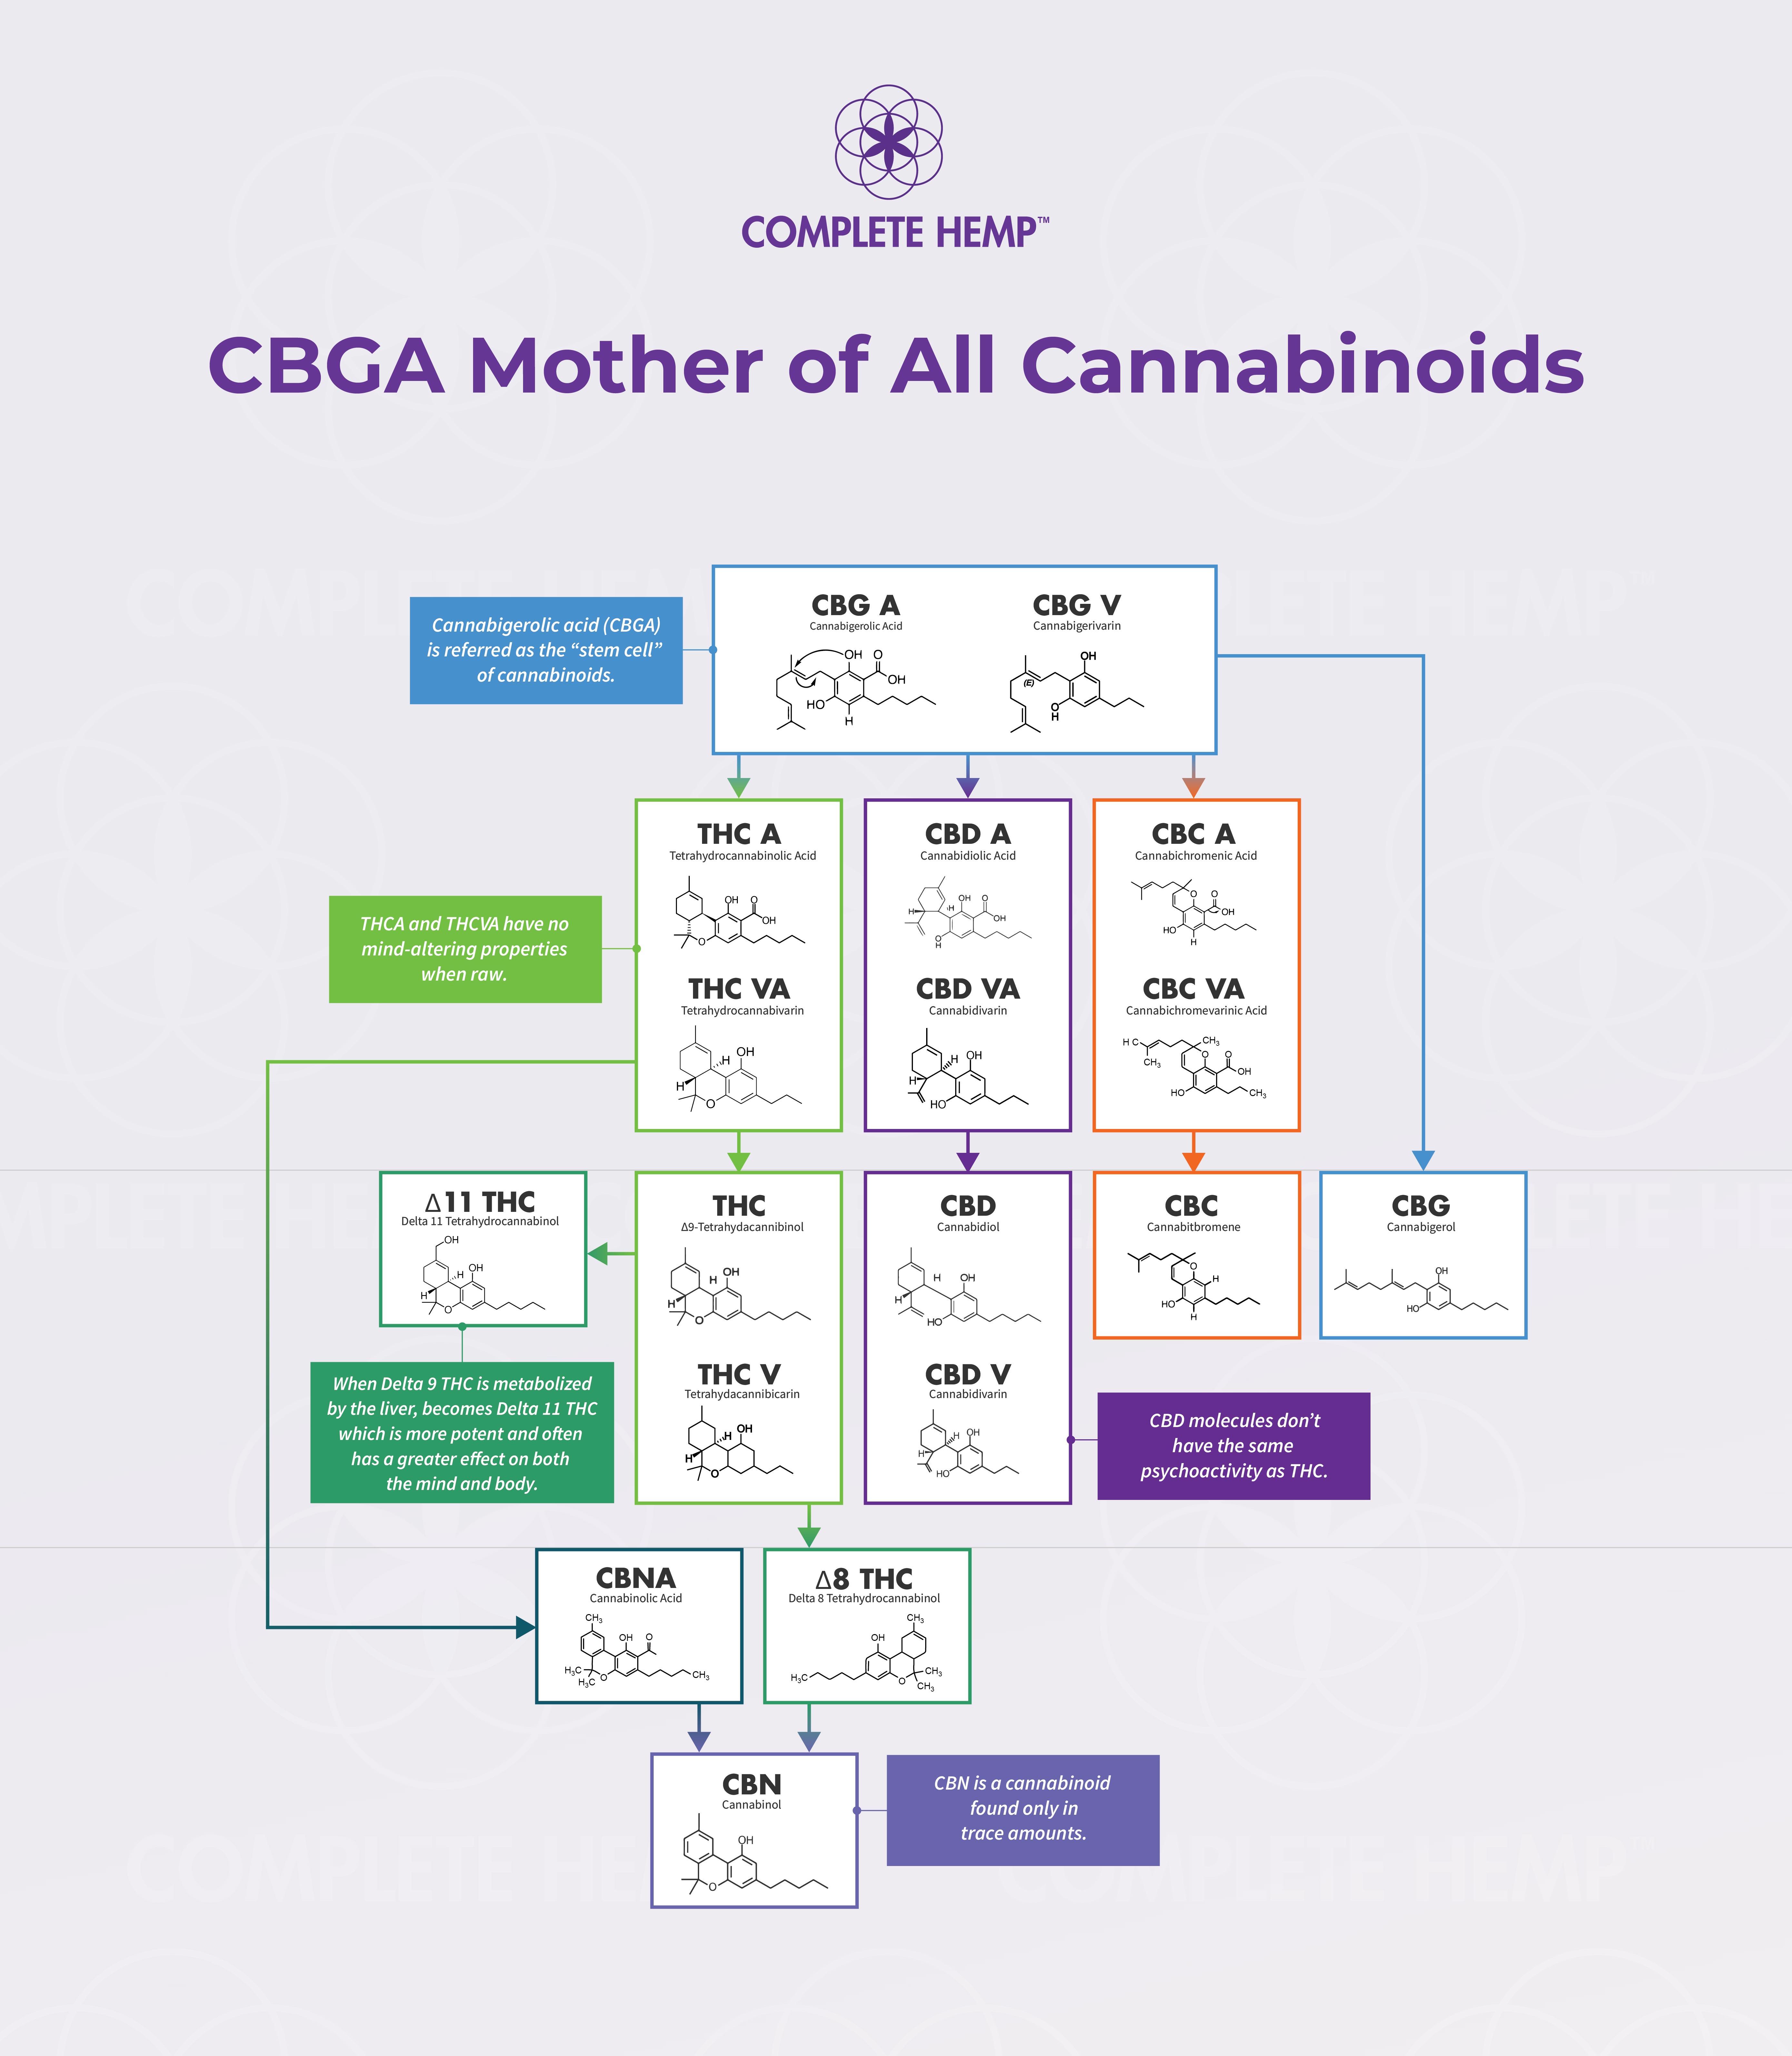 cbg-biosynthesis.jpg